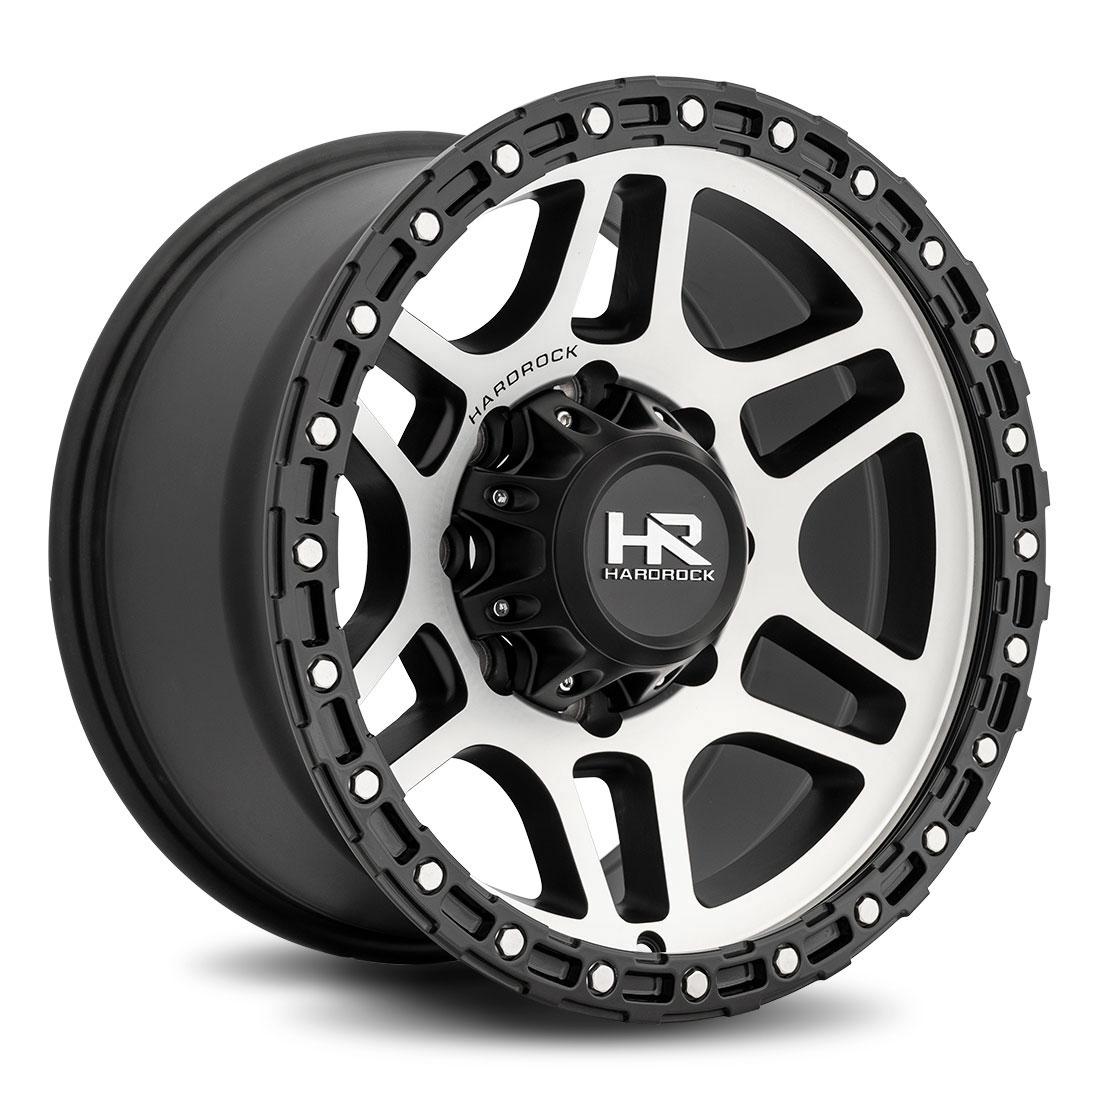 Hardrock Offroad Wheels H103 - Black Machine Face - 17x9